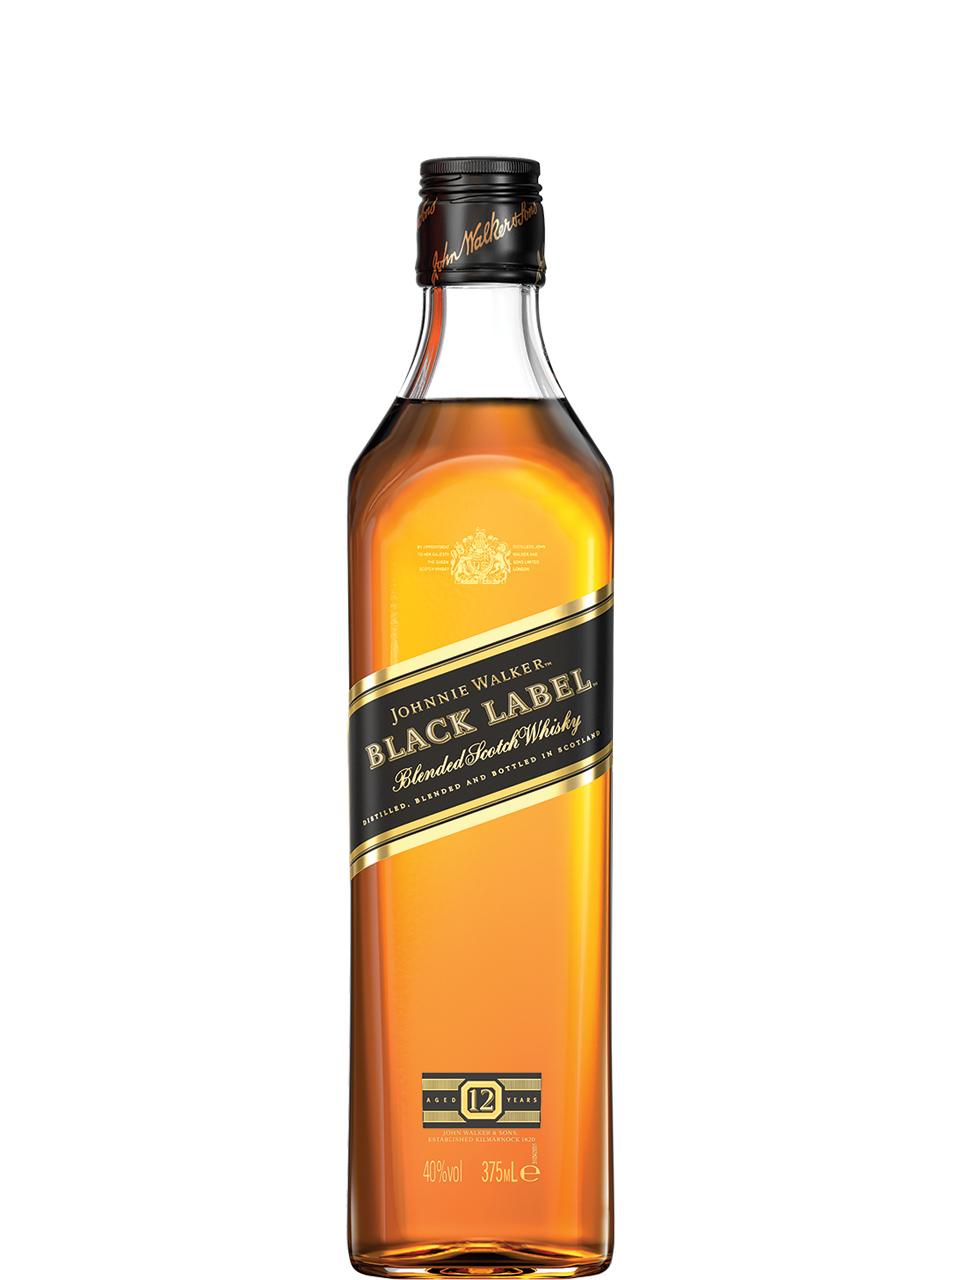 Johnnie Walker Black Label 12 YO Scotch Whisky